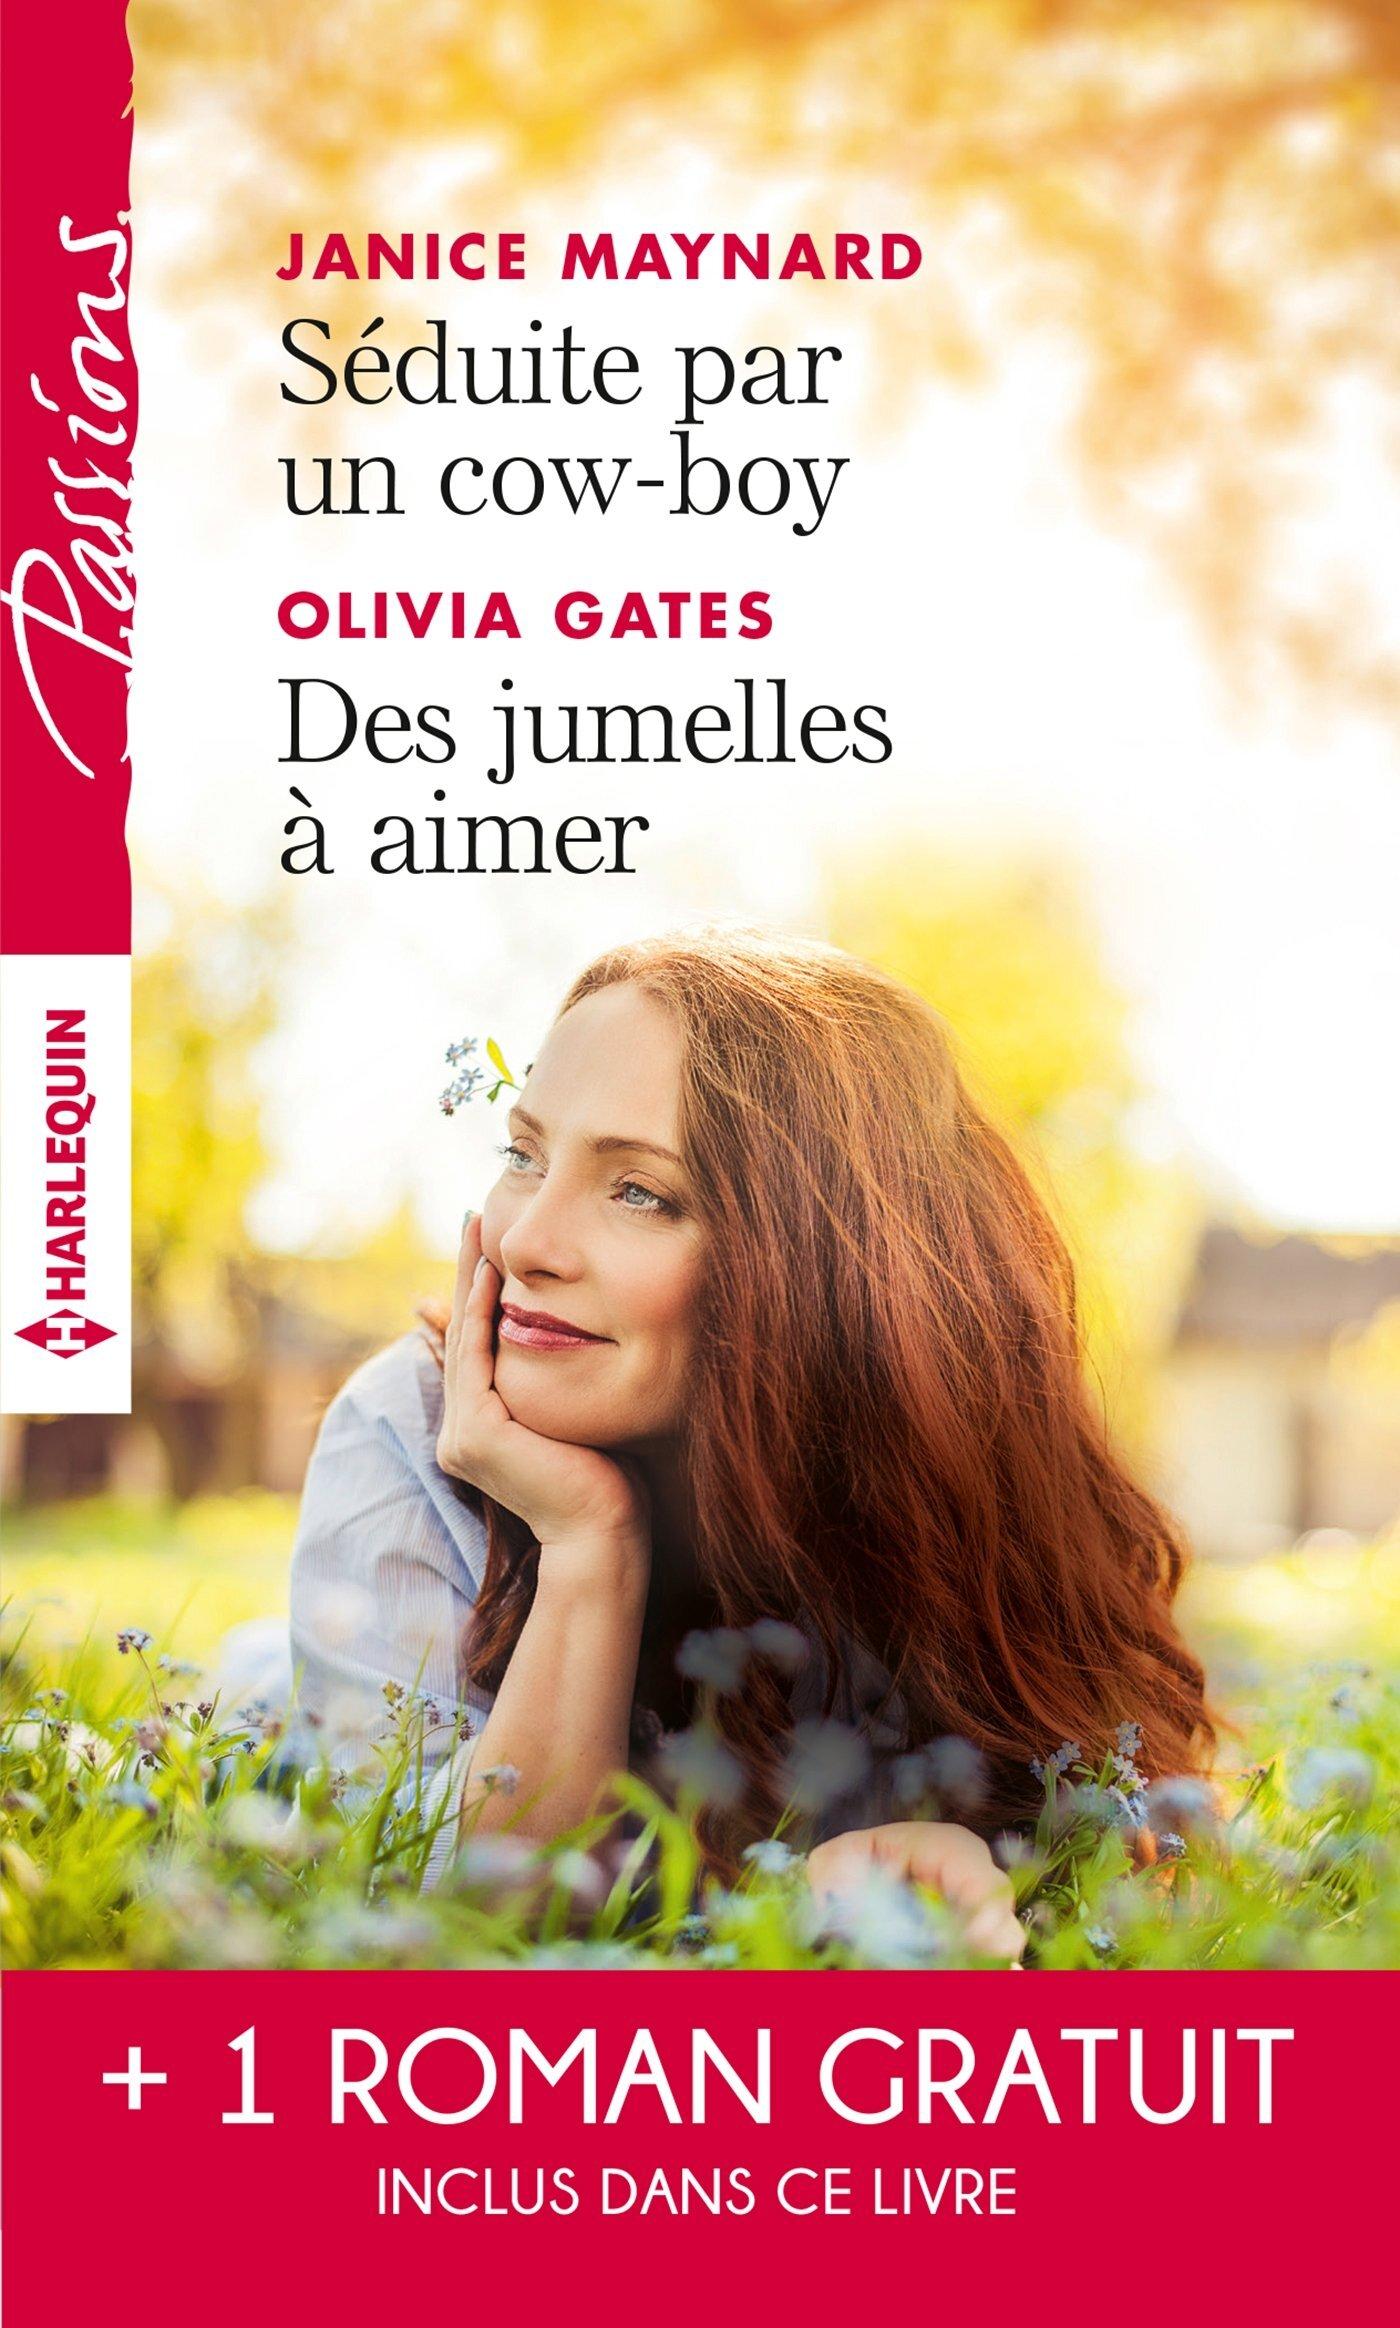 cdn1.booknode.com/book_cover/854/full/seduite-par-un-cow-boy-des-jumelles-a-aimer-853688.jpg